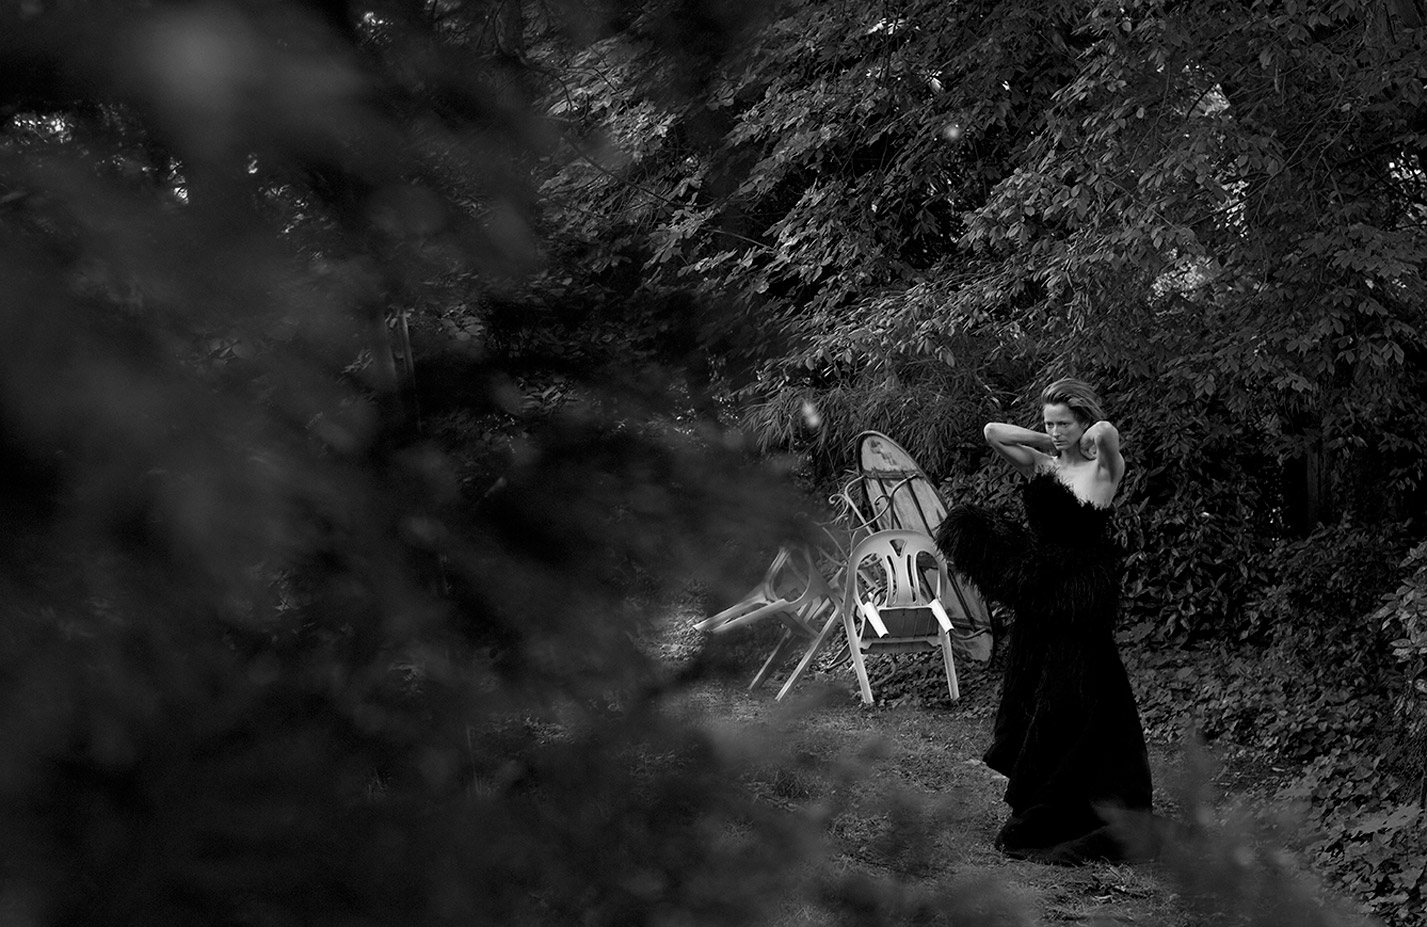 Тильда Суинтон, фотограф Питер Линдберг / фото 01